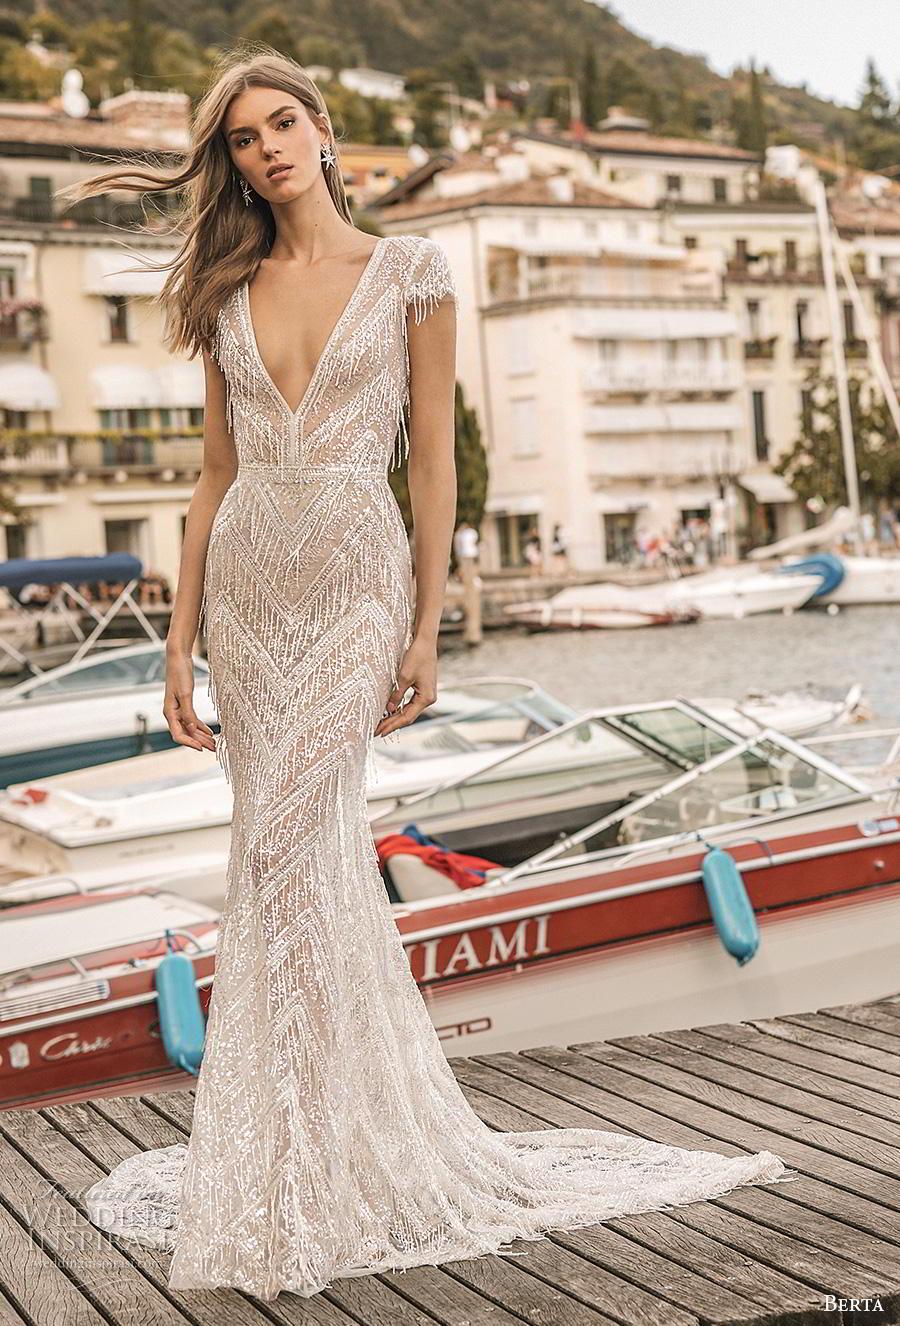 berta 2019 privee bridal cap sleeves deep v neck full embellishment glitzy elegant fit and flare wedding dress backless v back medium train (10) mv